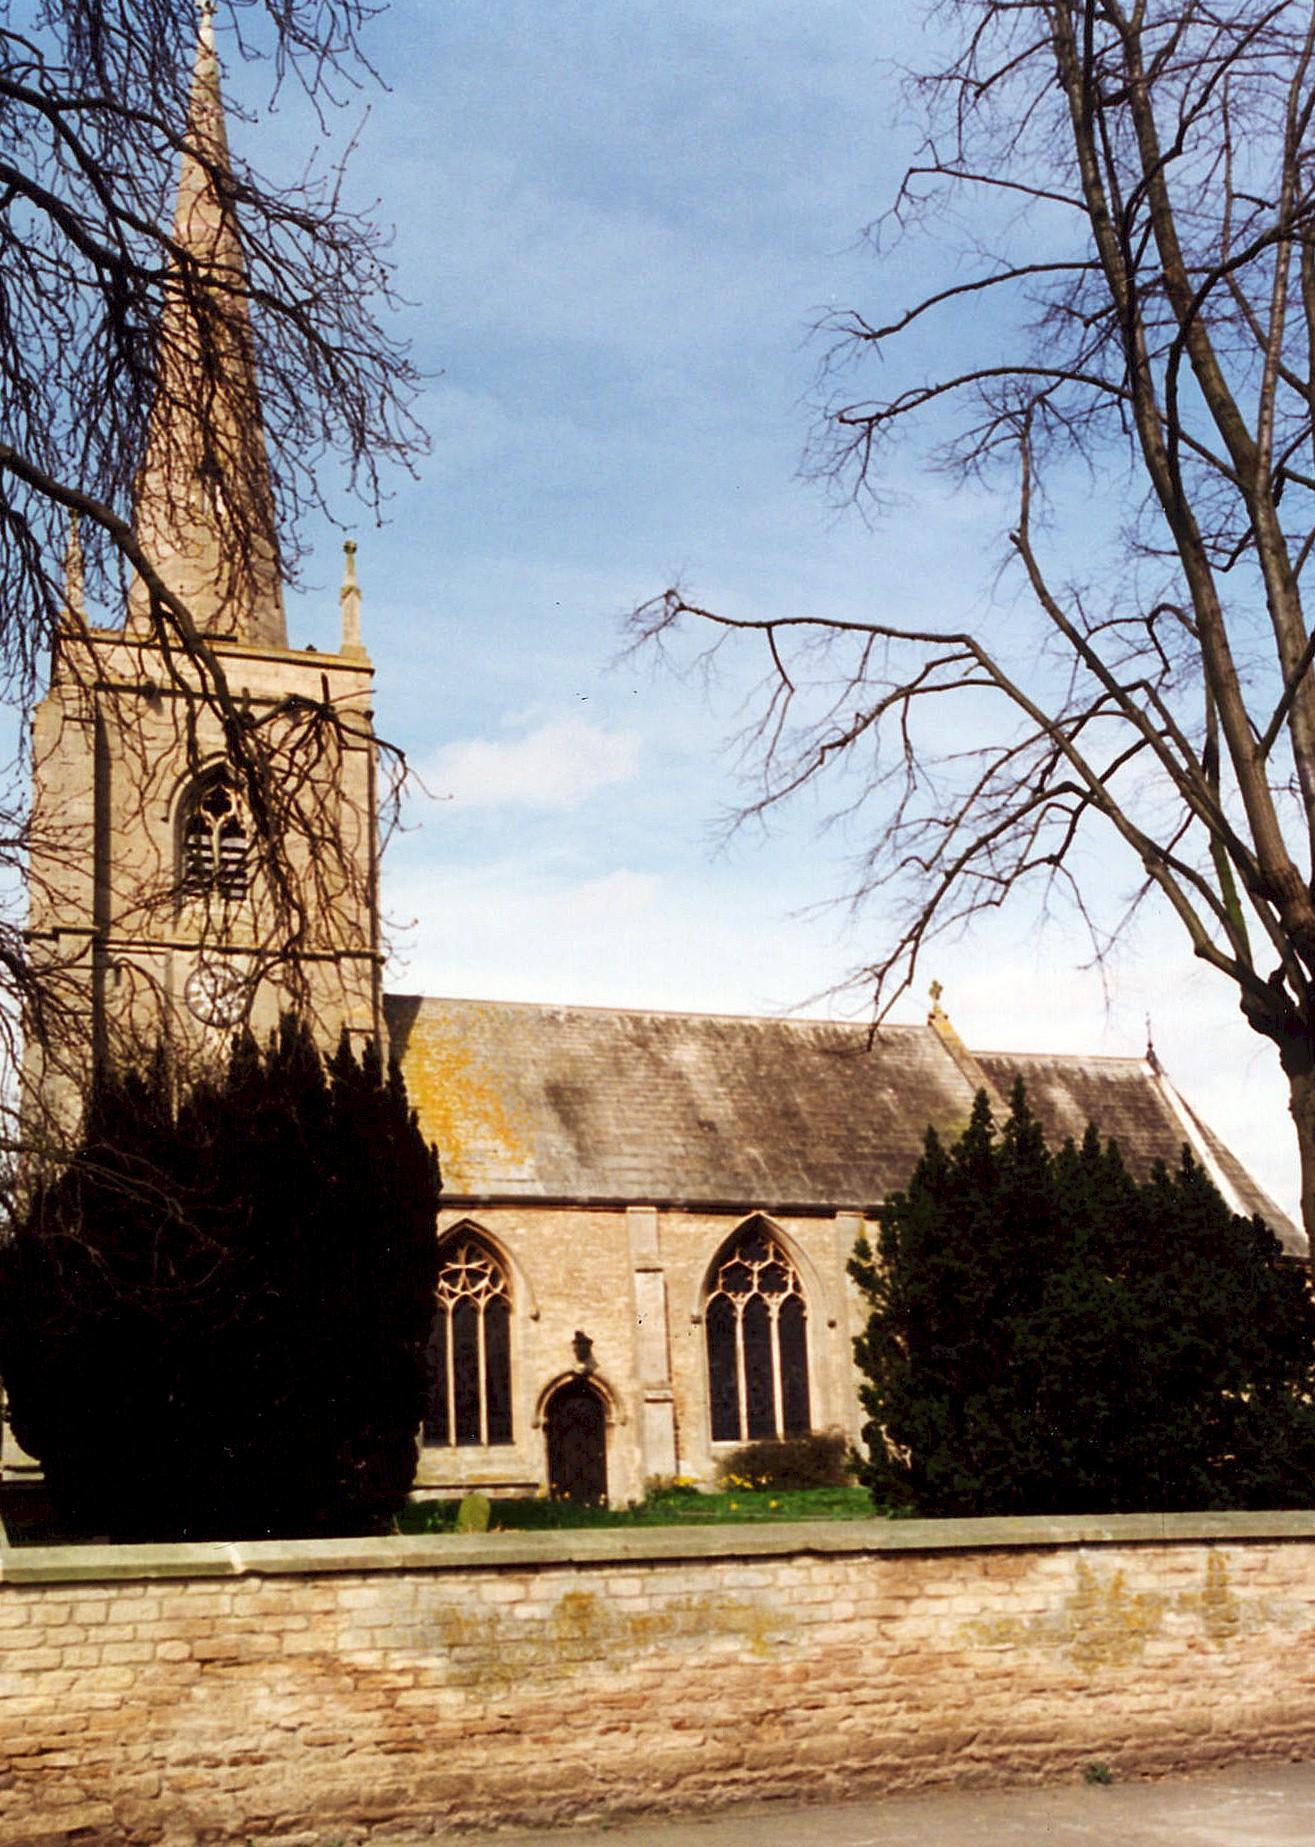 St. Botolph Church